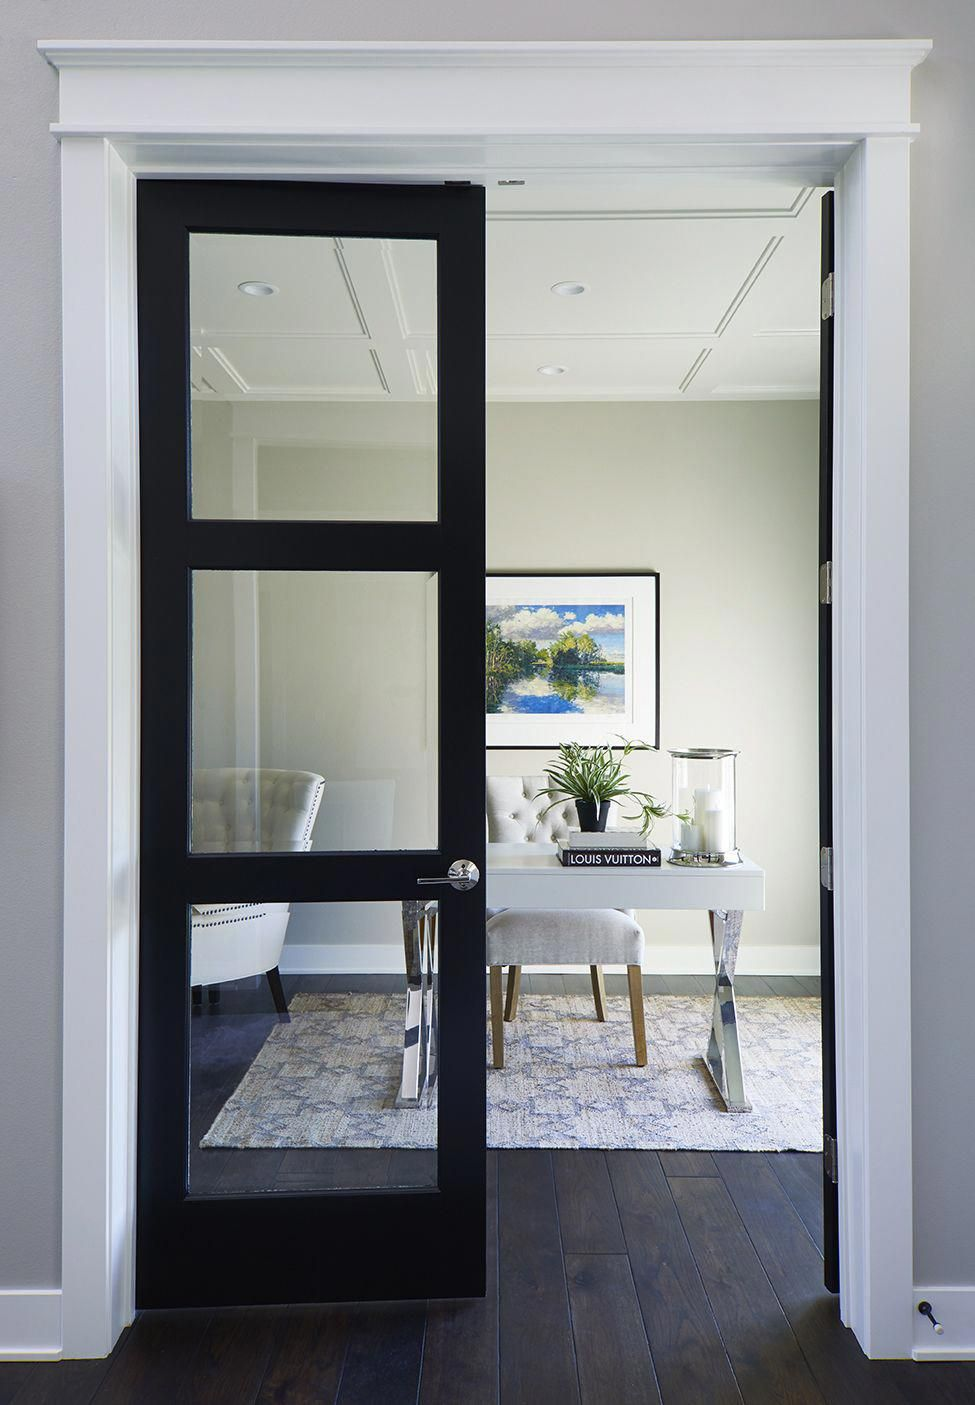 6 Foot Interior French Doors